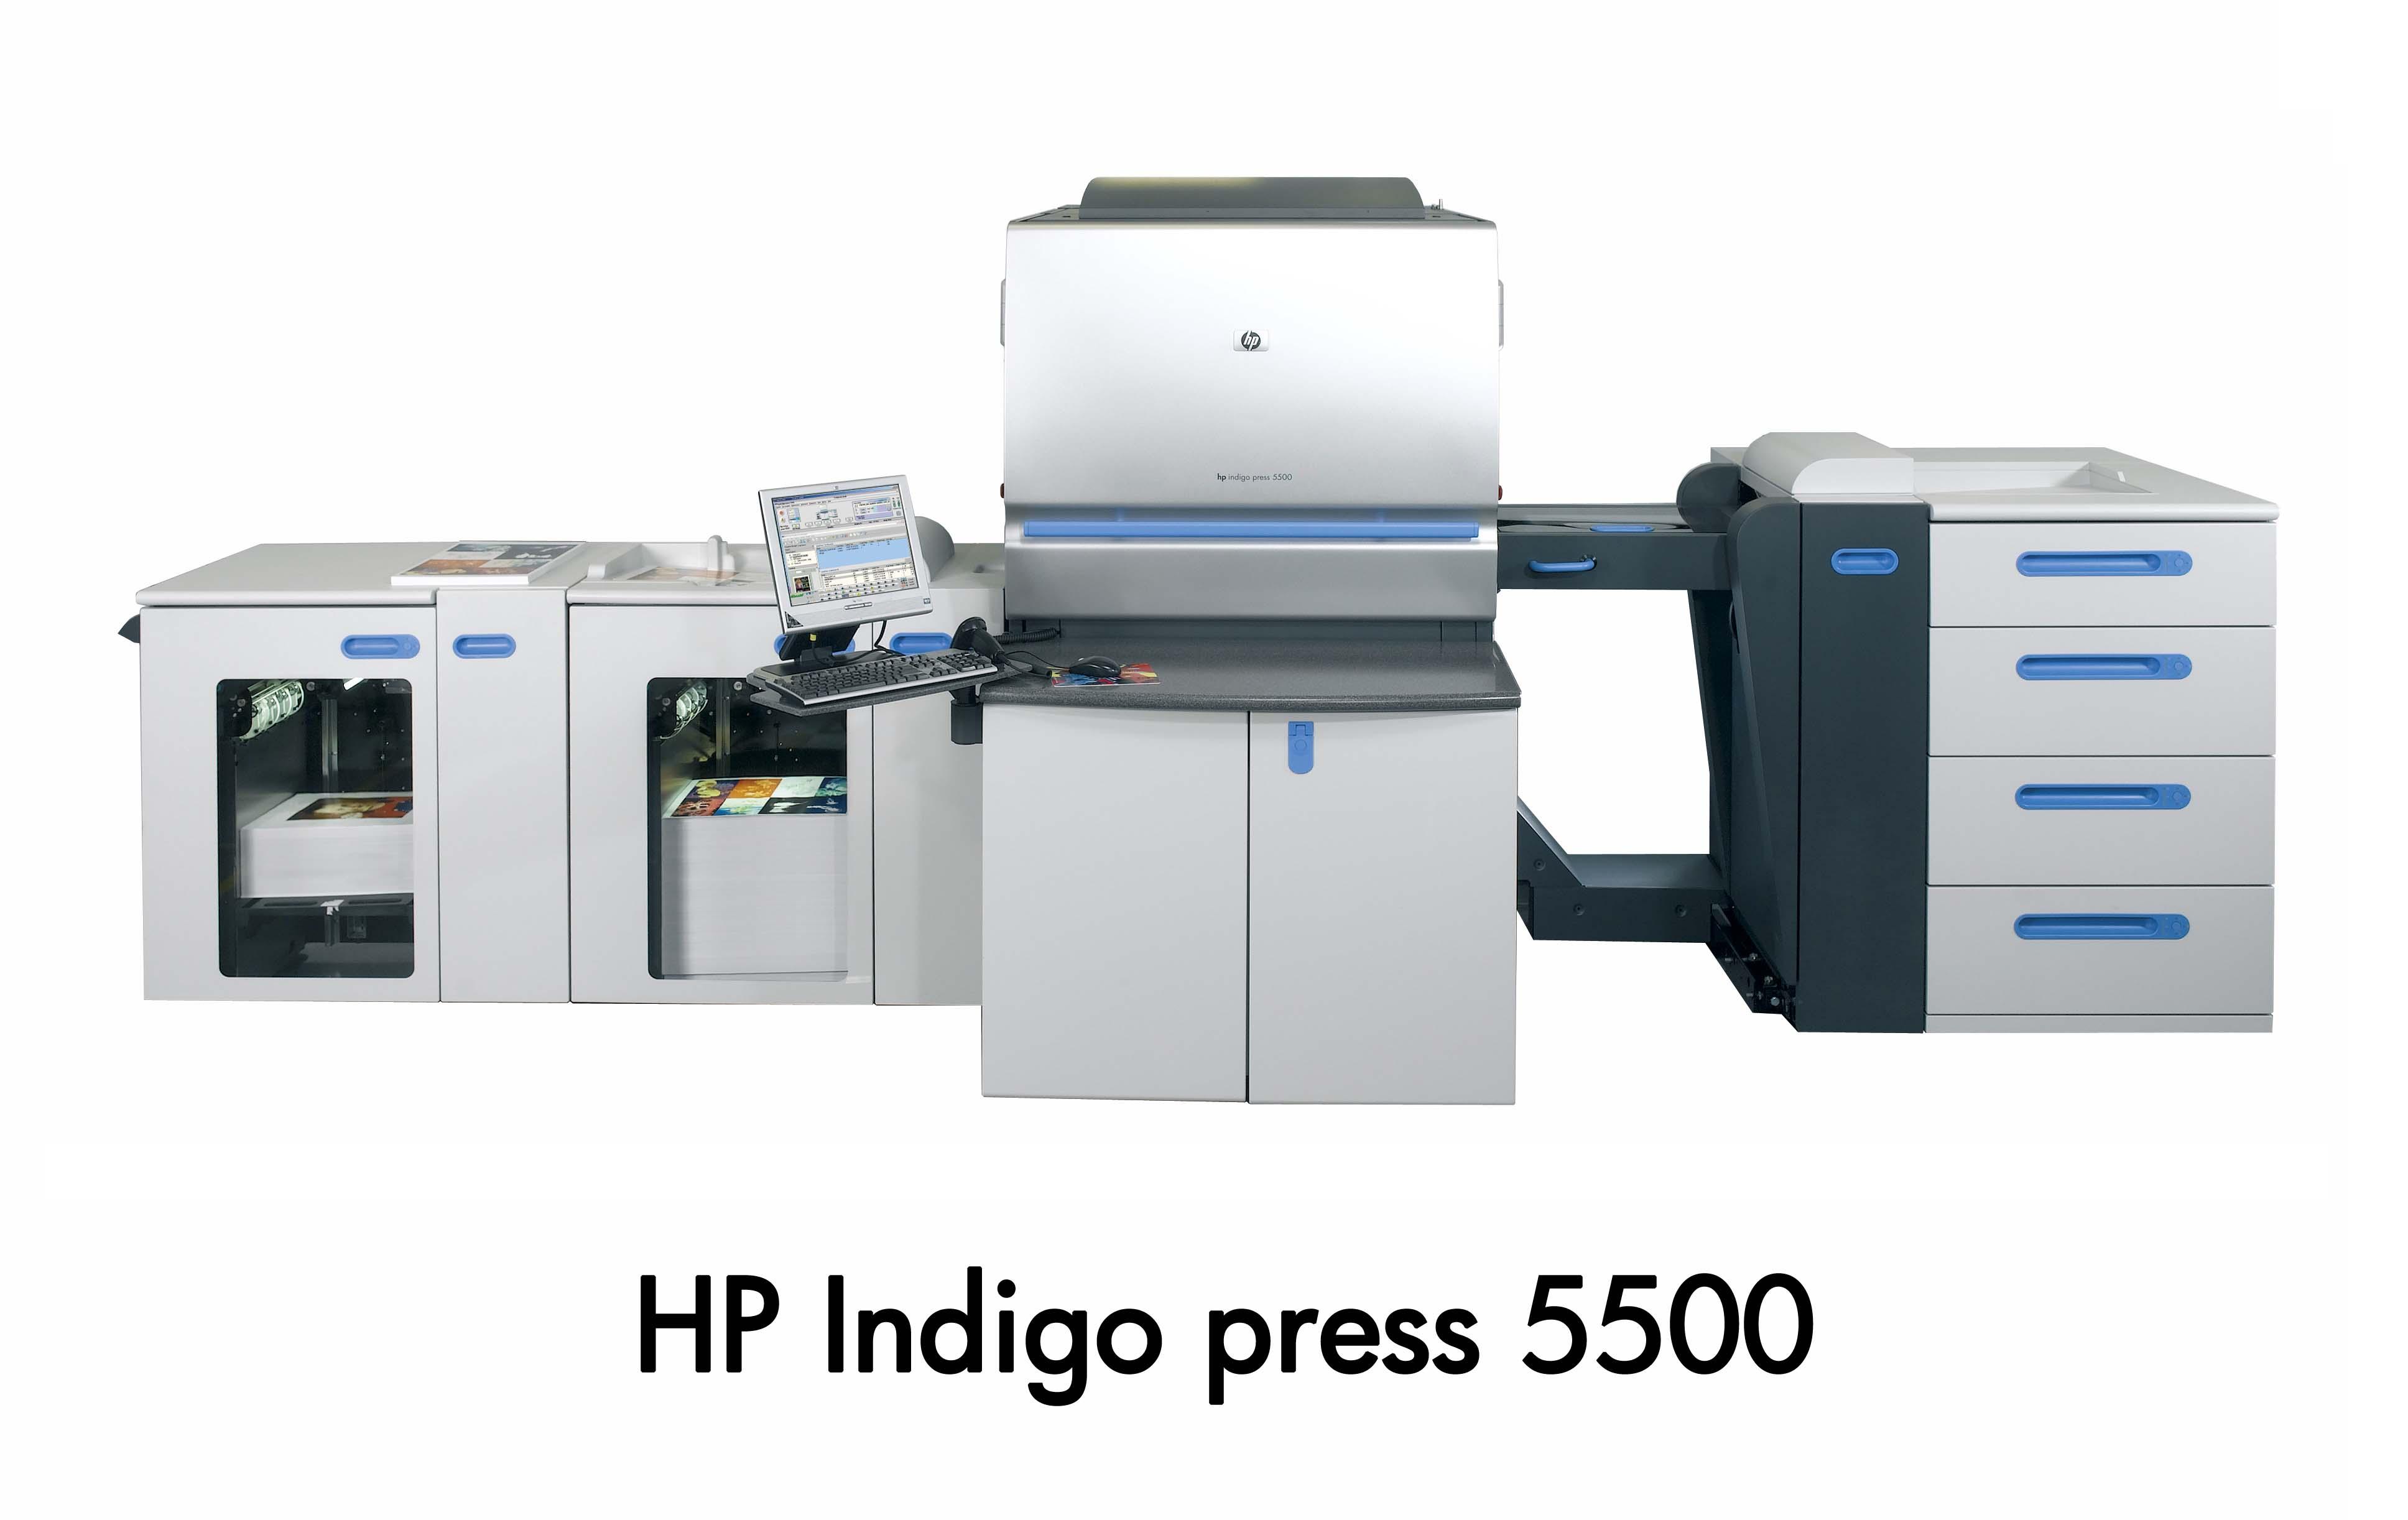 Indigo 5500 Digital Press